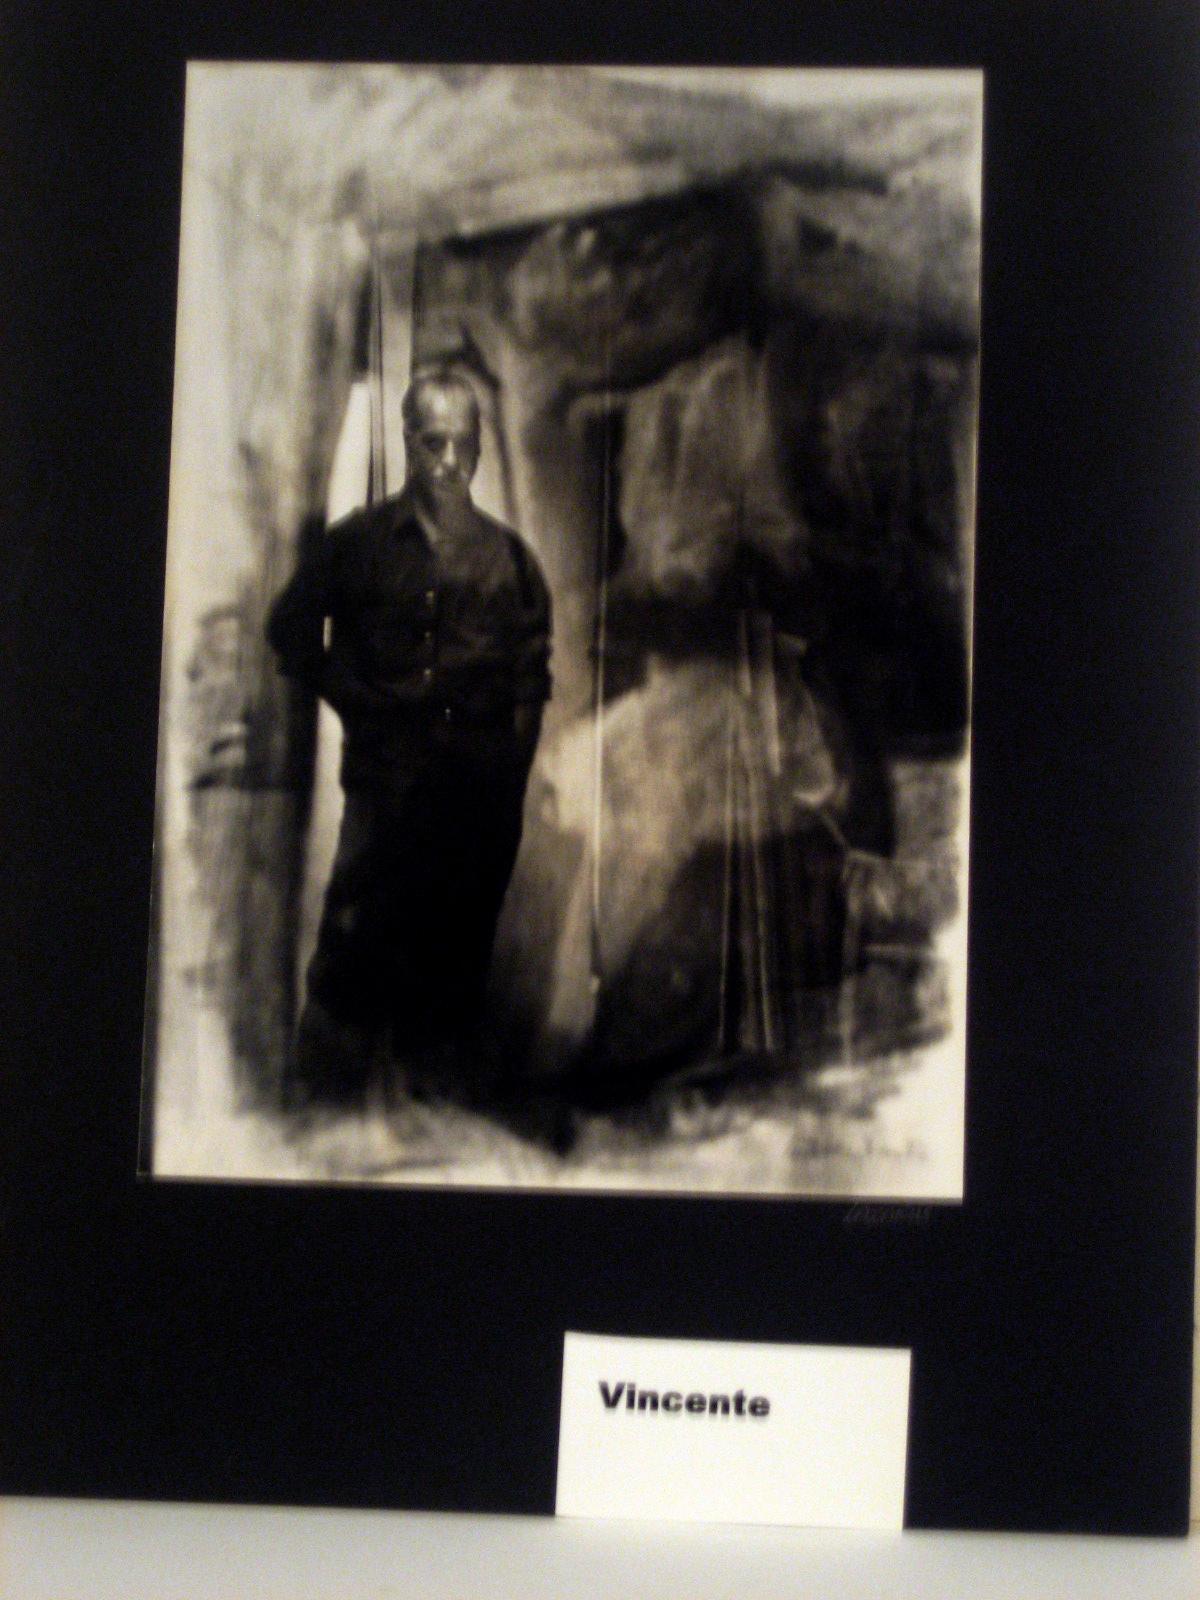 Vincenti 3.jpg